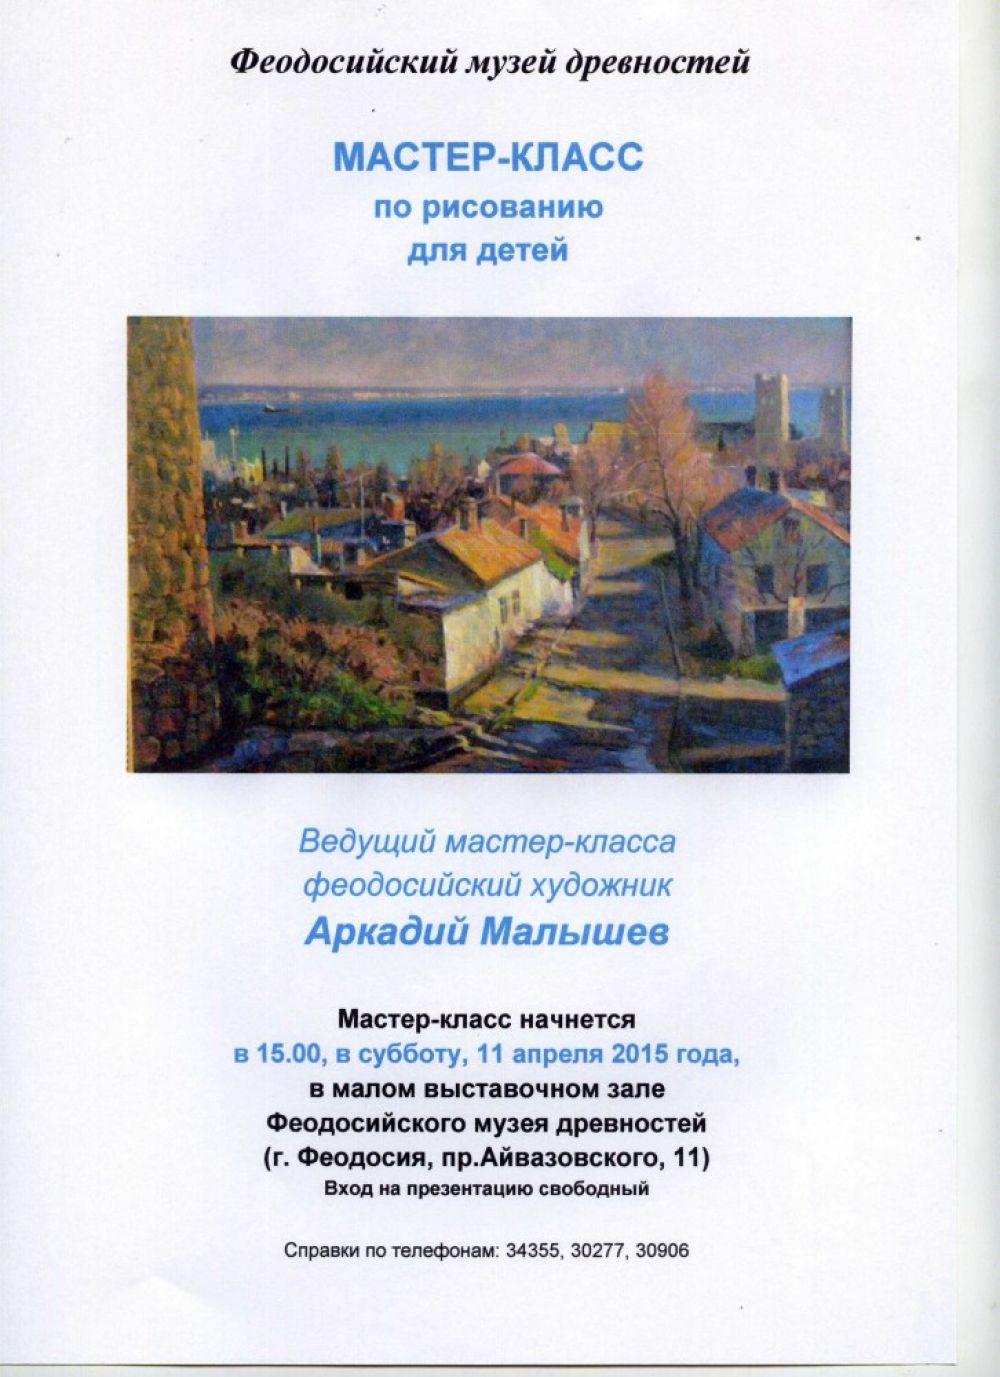 Мастер-класс по рисованию от Аркадия Малышева!